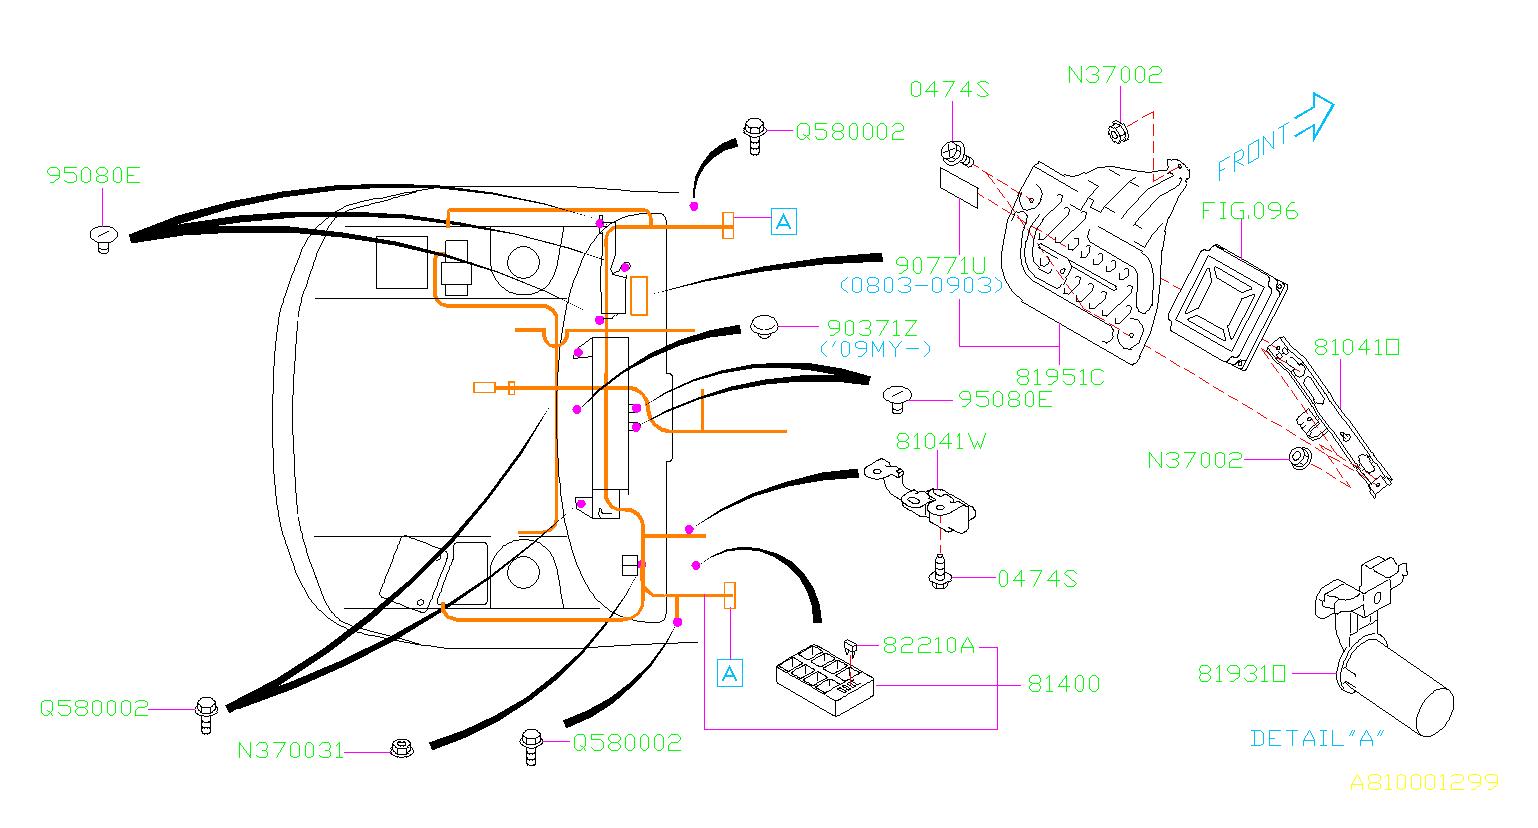 2010 Subaru Wrx Cover  Wiring  Main  Harness  Electrical